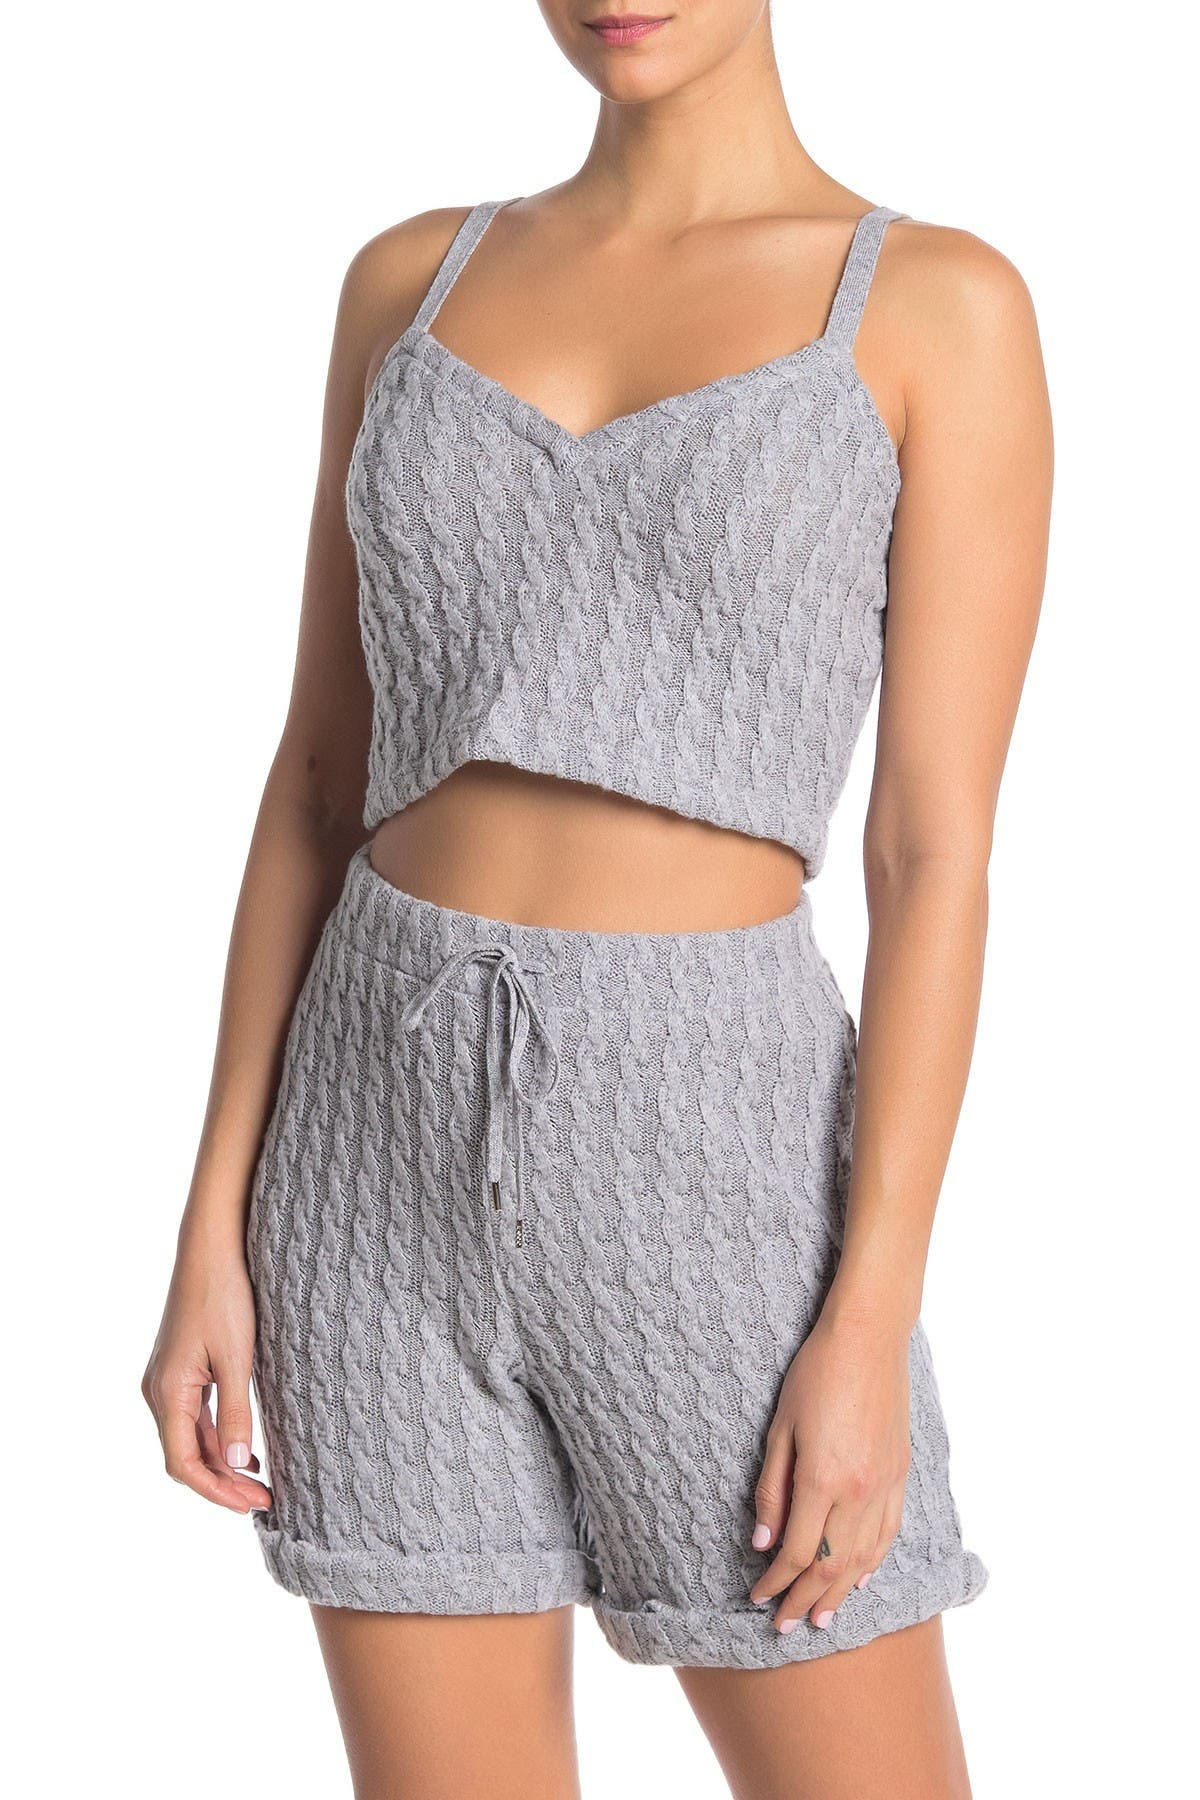 Image of Cosabella Jasmin Crop Cable Knit Top